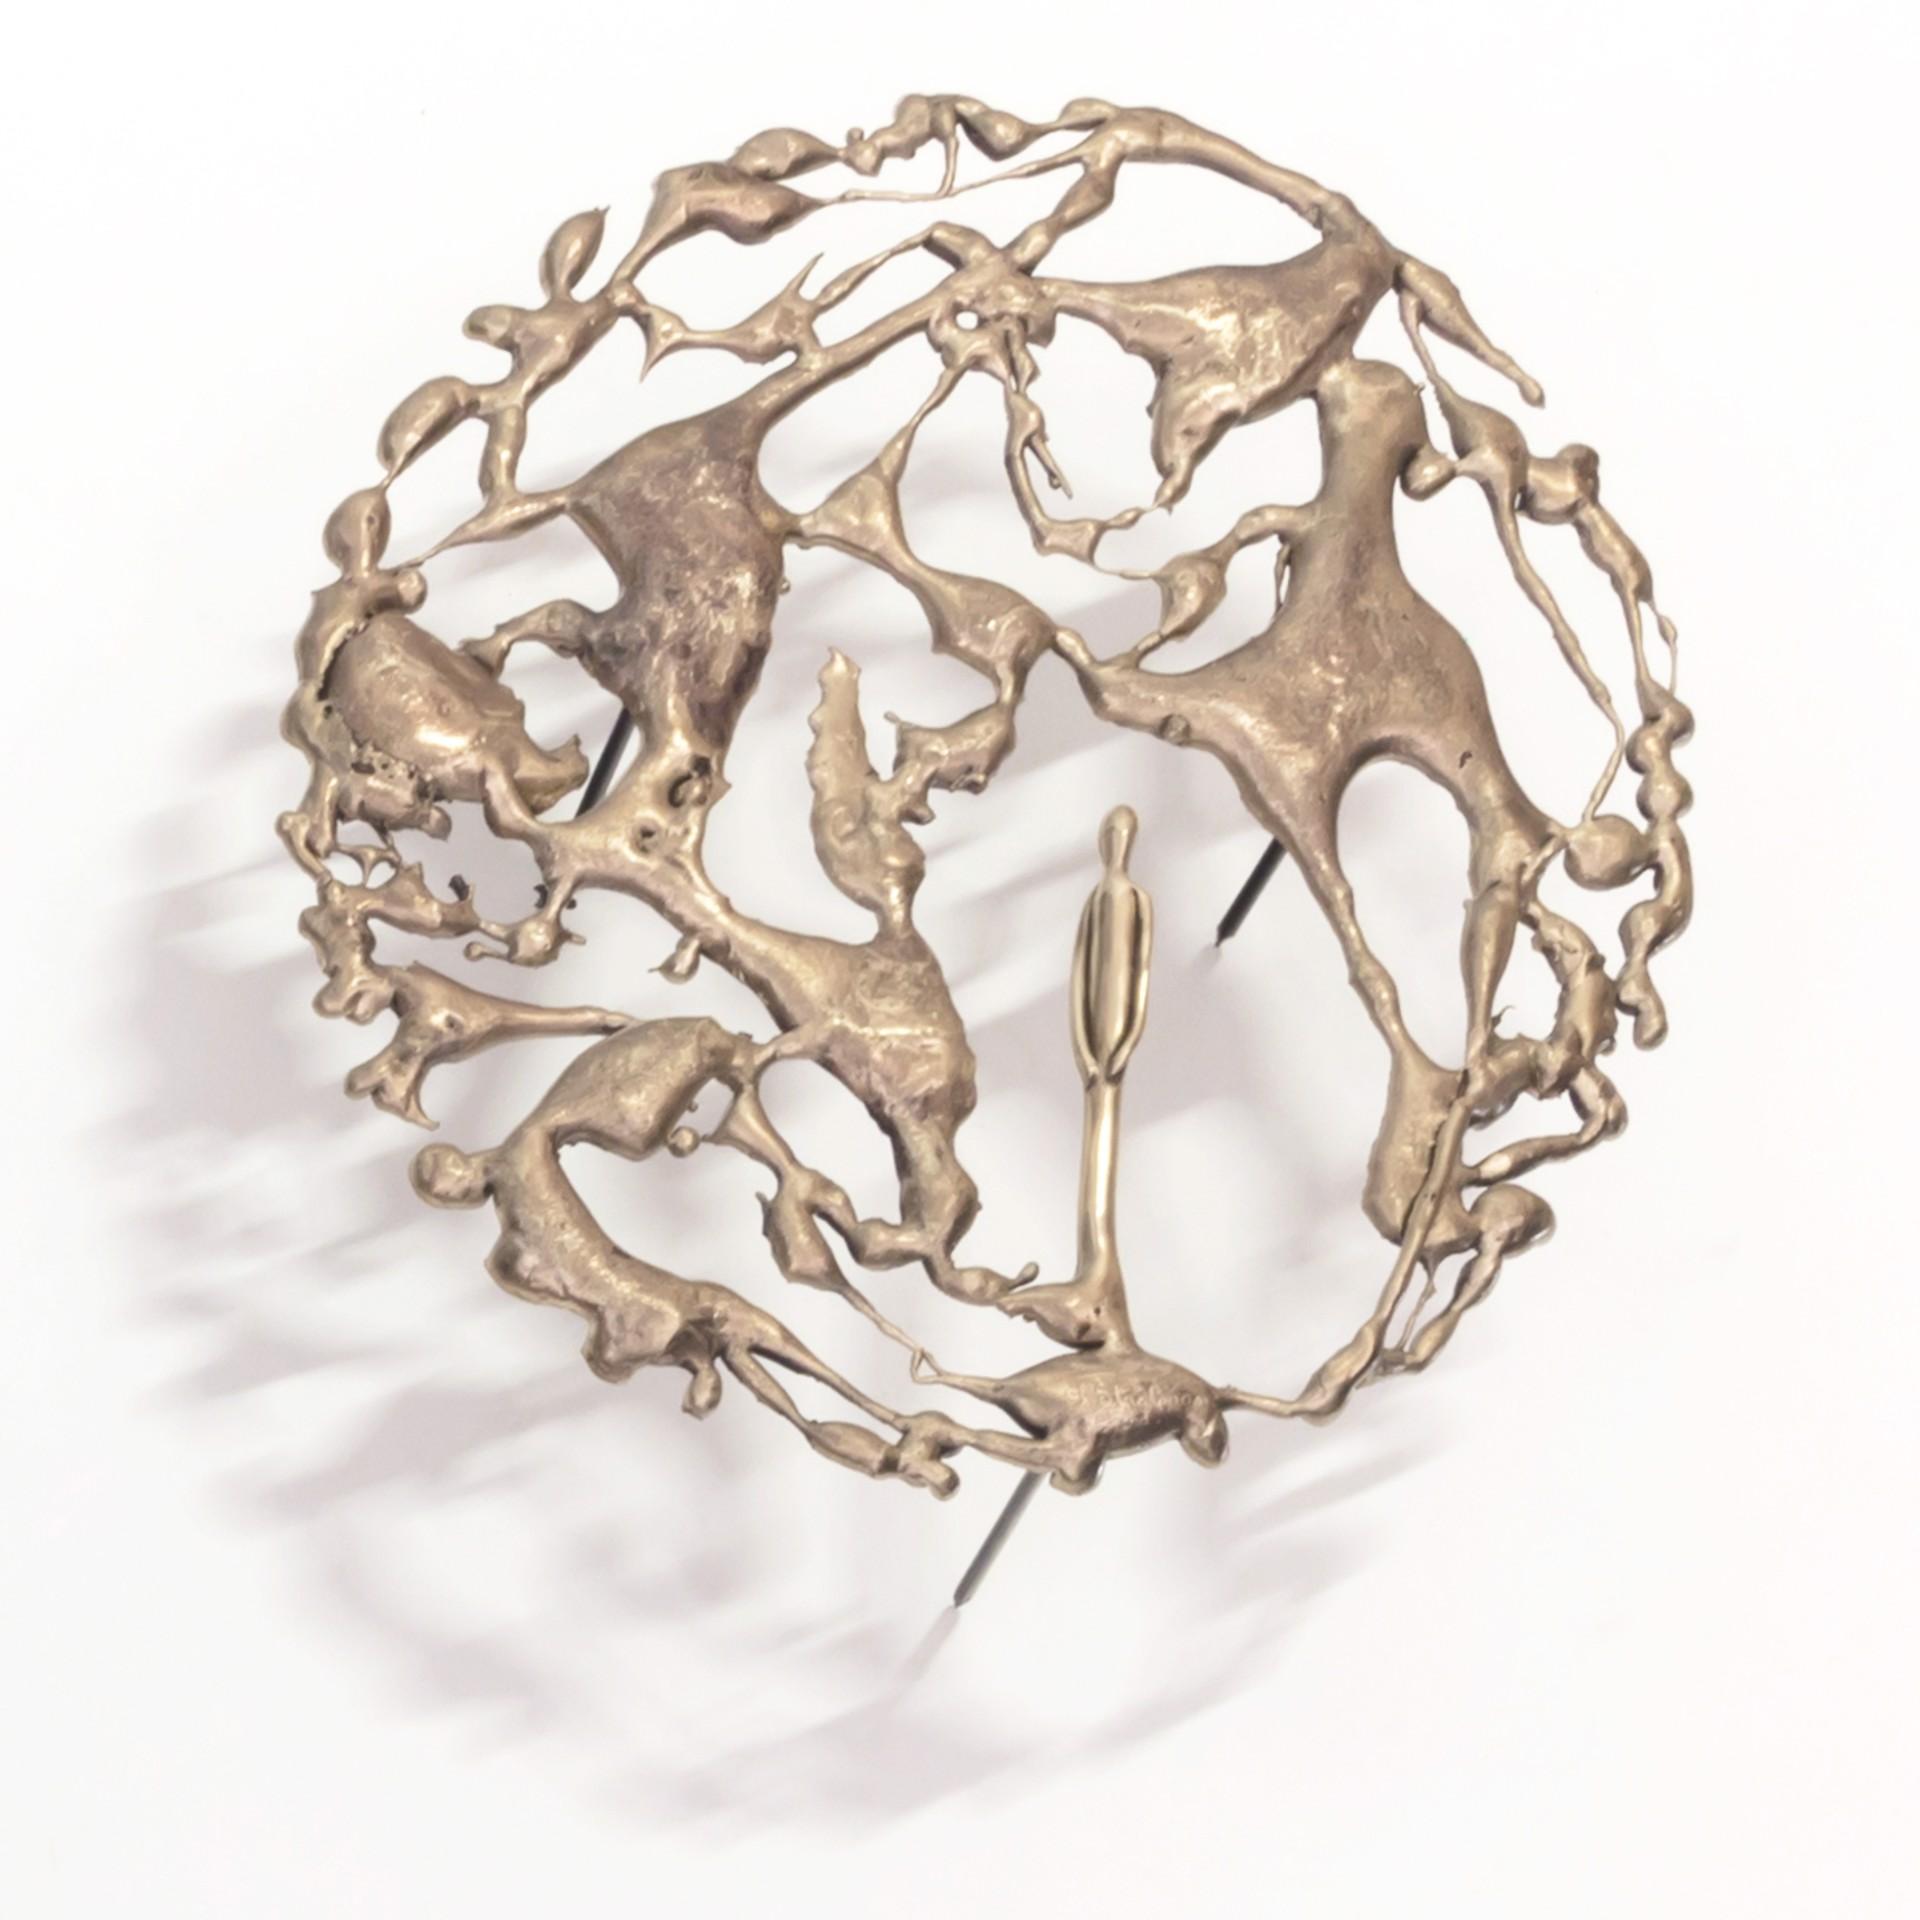 "The Gravity Between Us (10"") by Jennyfer Stratman"